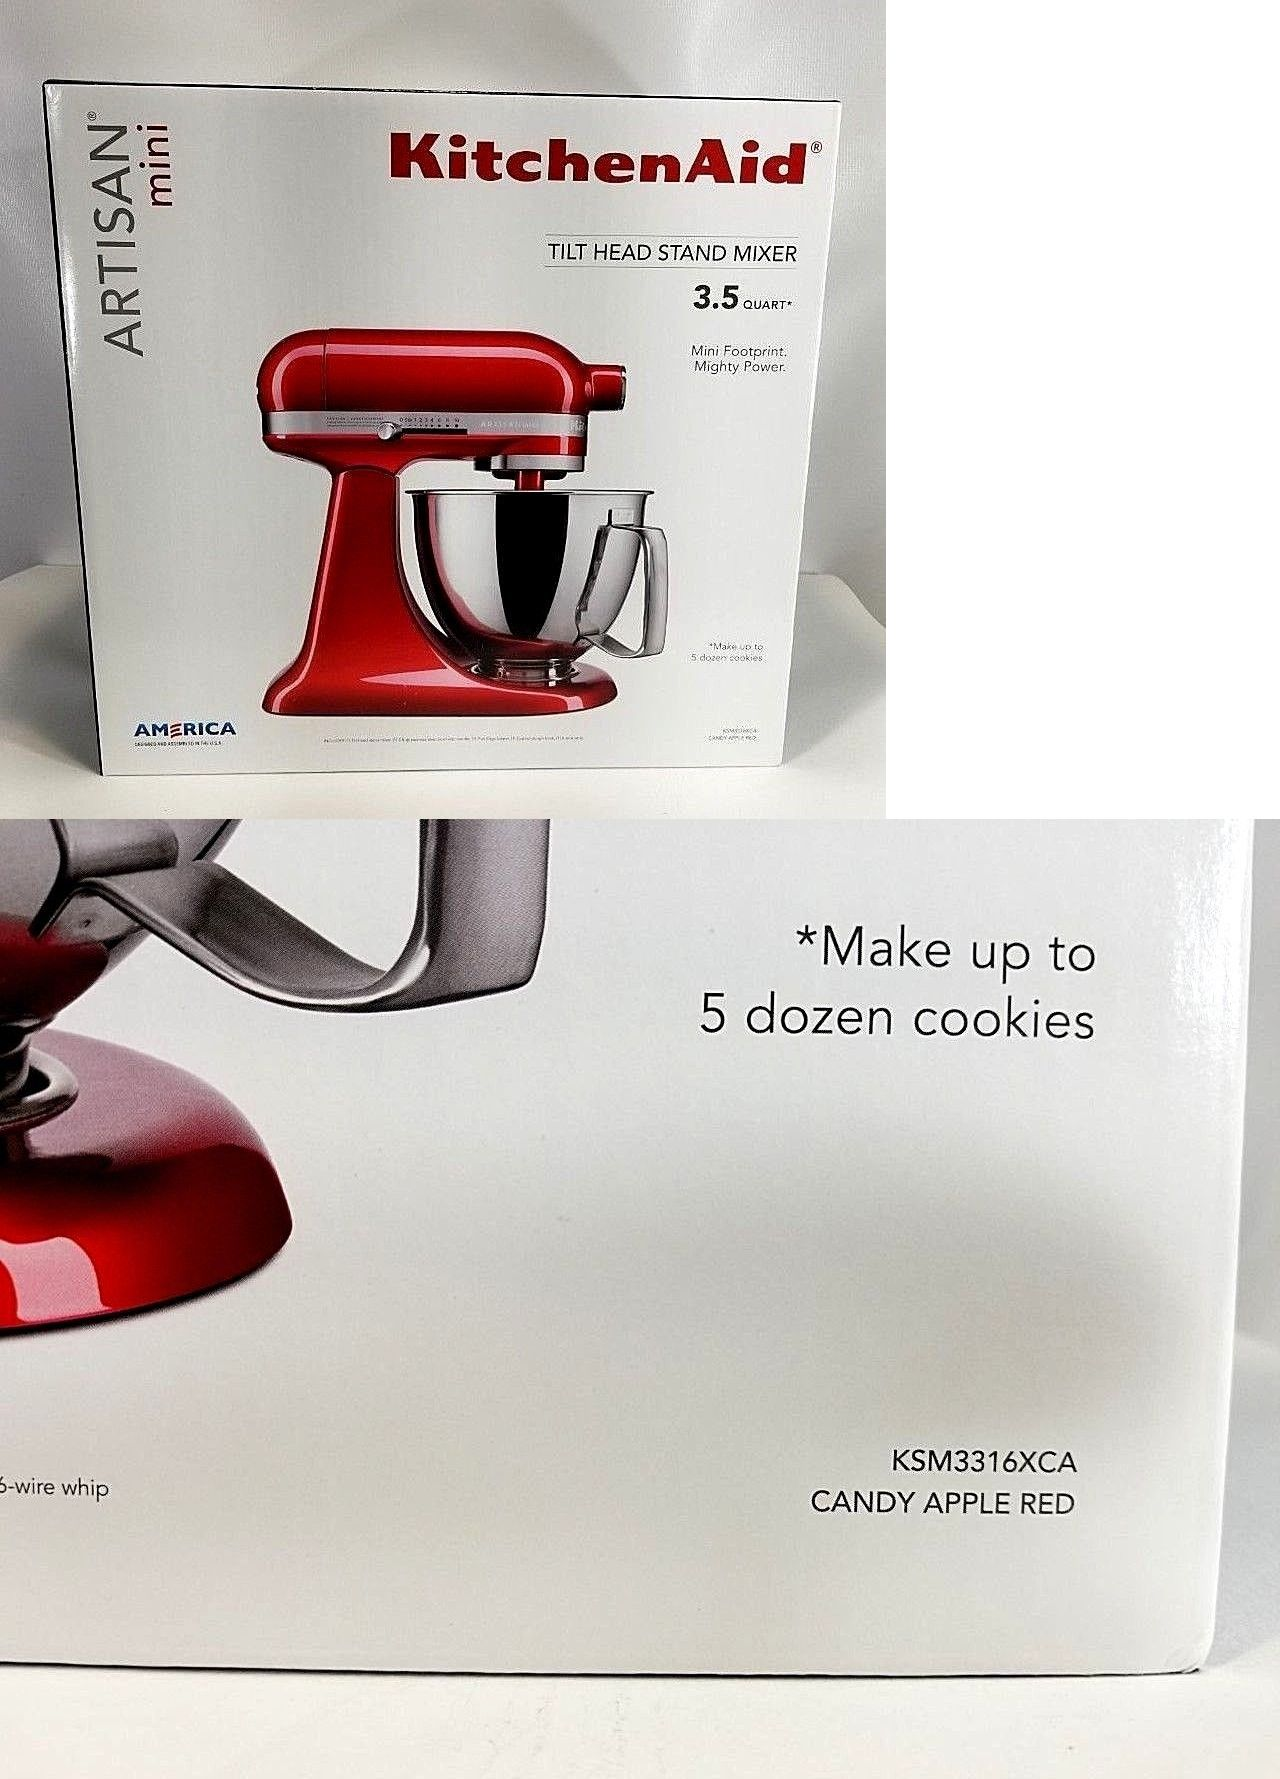 kitchenaid artisan mini 3.5 quart mixer